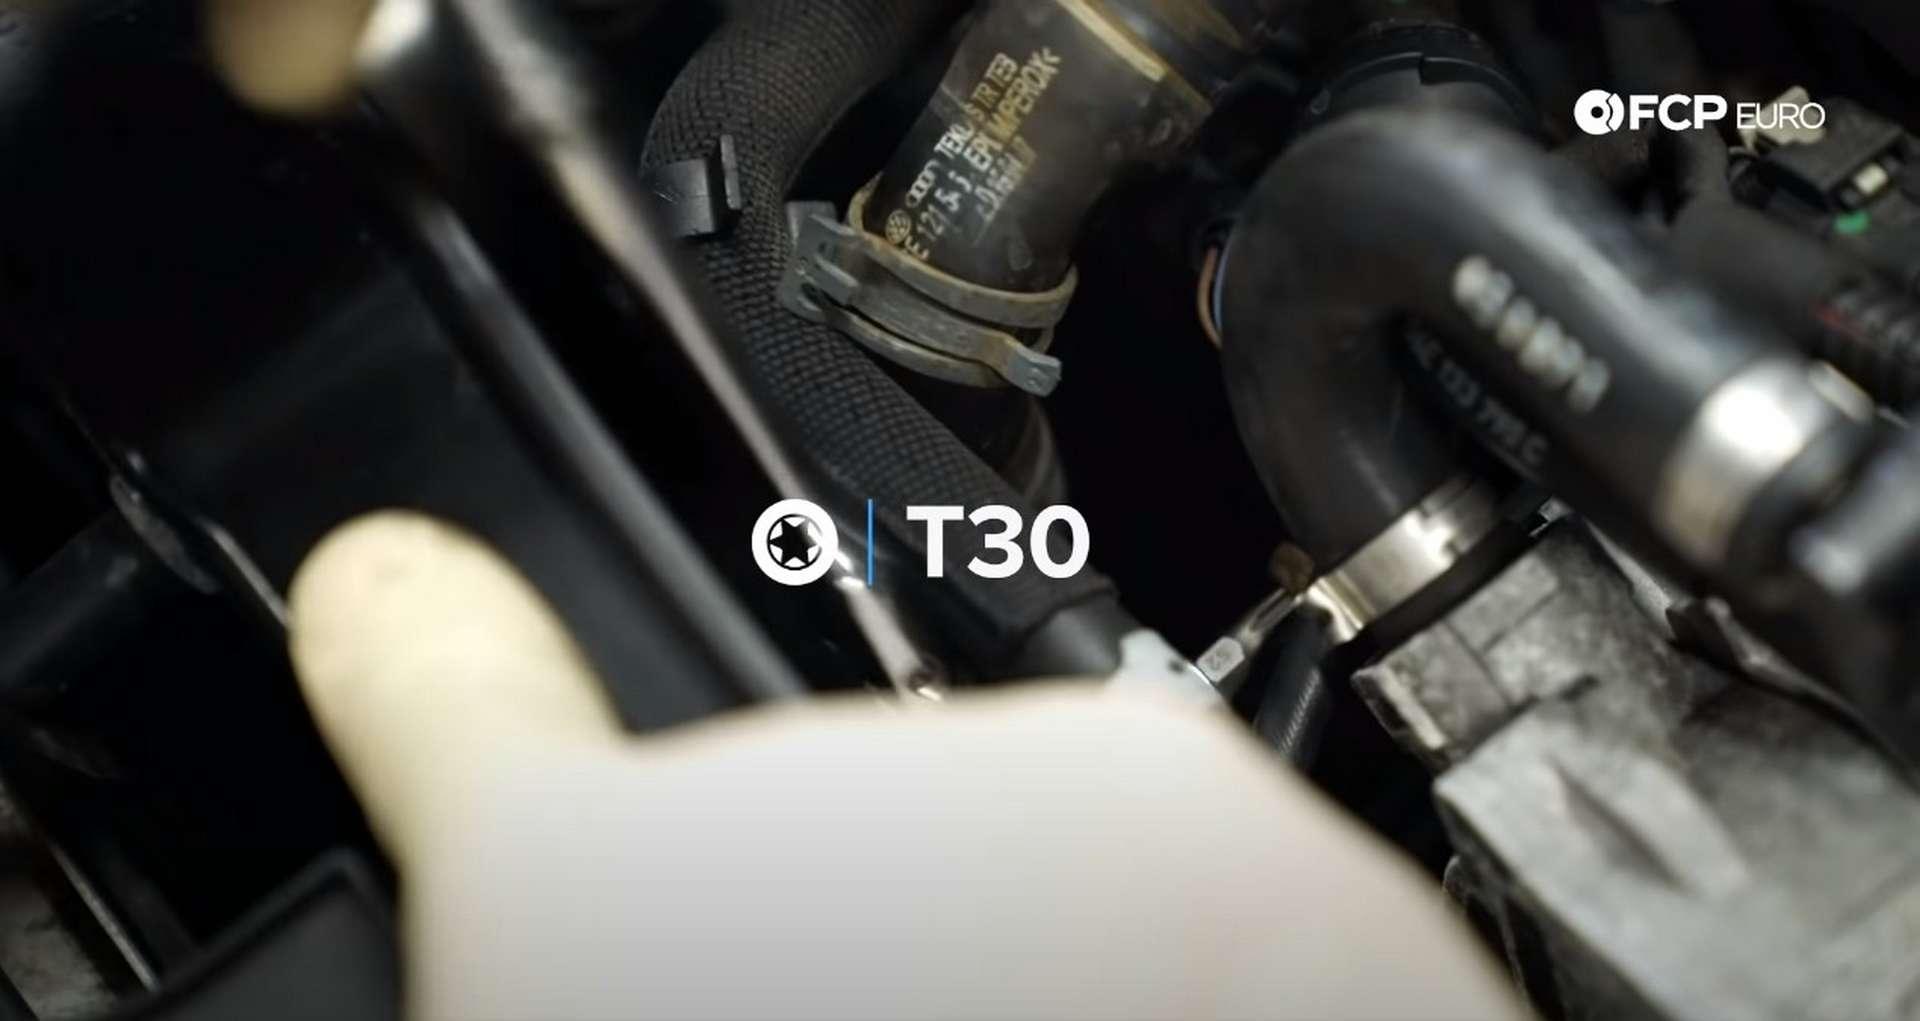 DIY Audi 3.0t Walnut Blasting Intake Valves removing coolant hose mounting bolt